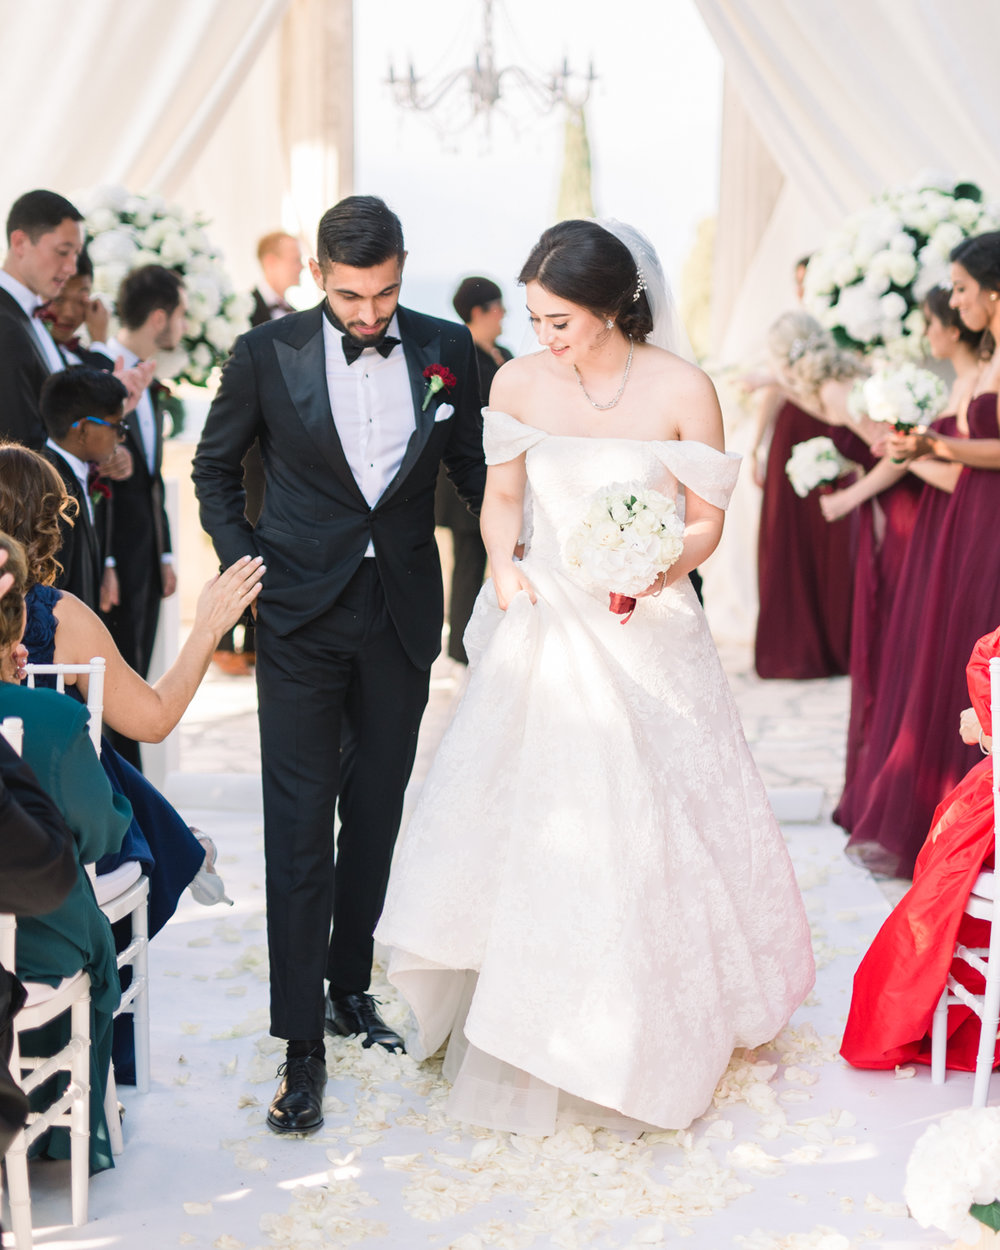 Palace_Villa_Cortine_Hotel_Italian_Wedding_Photographer_Sirmione_AKP-35-Nicole_Khudoyan_Mitchell_Kapoor.jpg